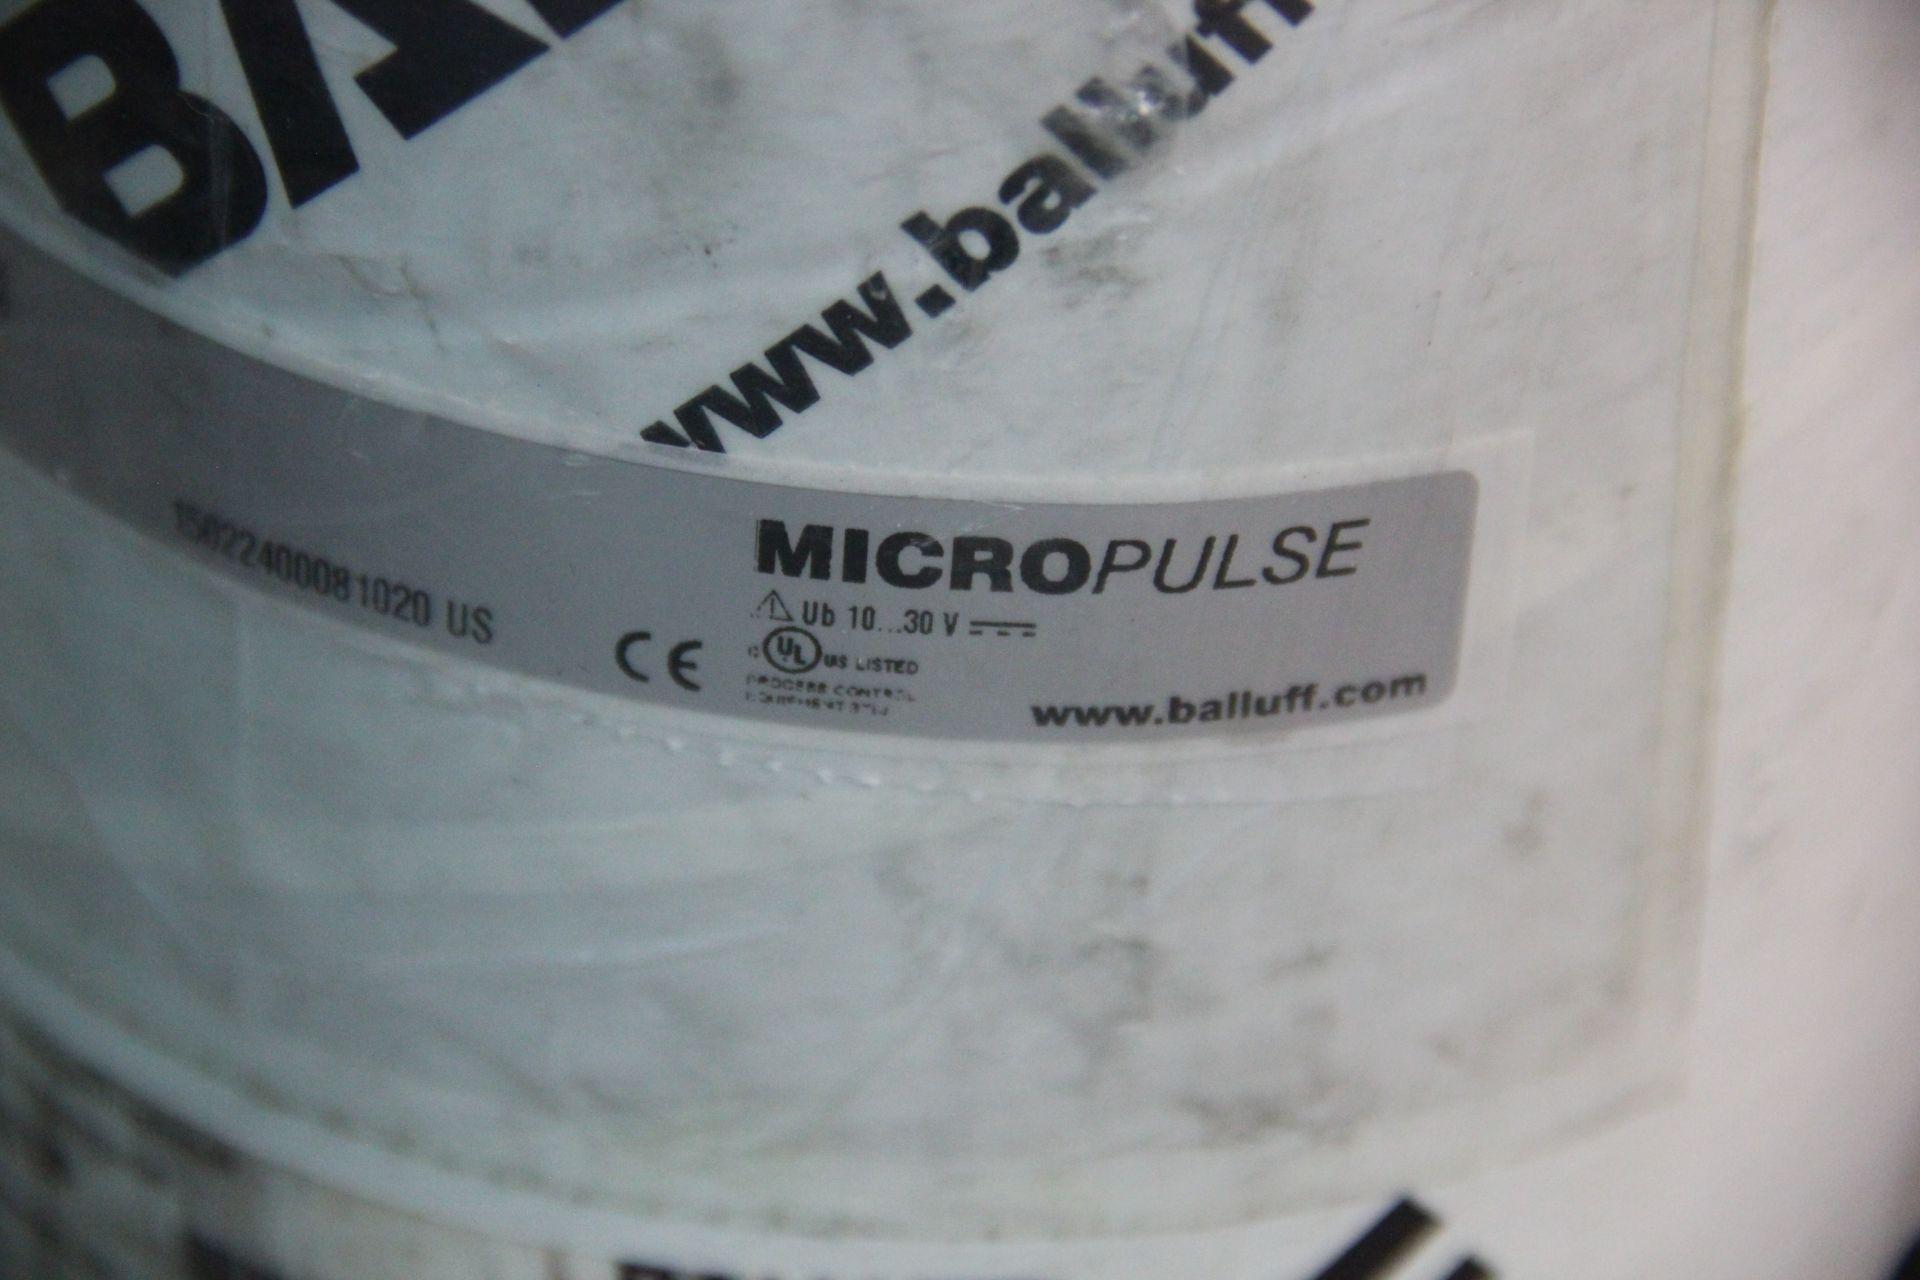 NEW BALLUFF MICROPULSE MAGNETOSTRICTIVE LINEAR POSITION SENSOR - Image 3 of 6